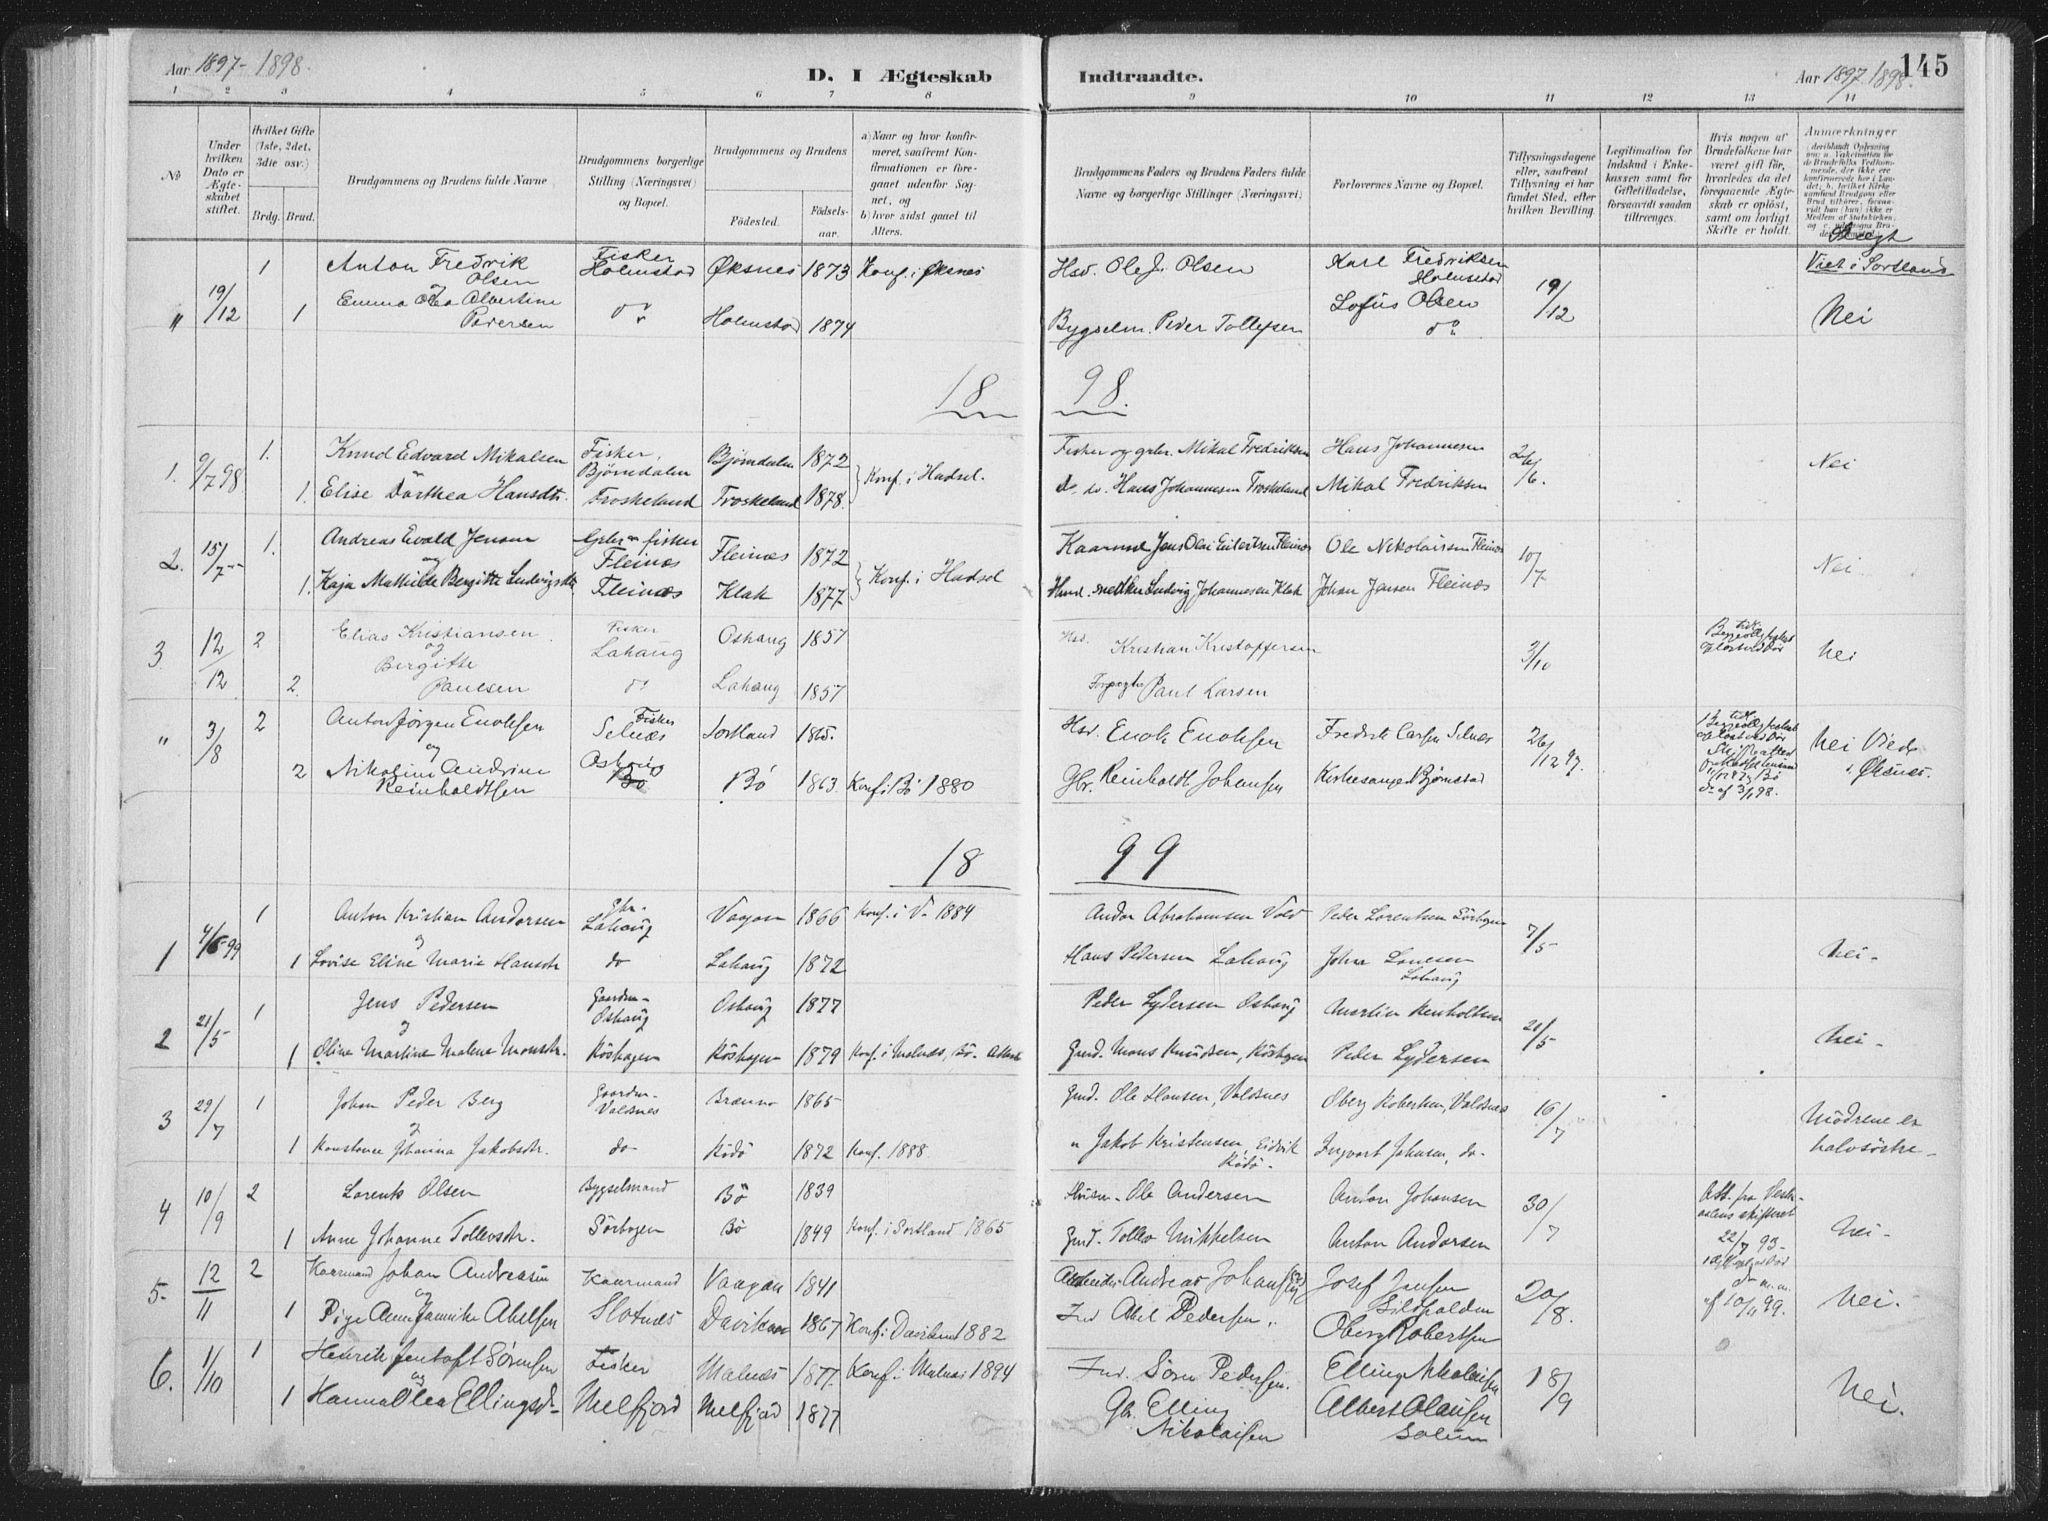 SAT, Ministerialprotokoller, klokkerbøker og fødselsregistre - Nordland, 890/L1286: Ministerialbok nr. 890A01, 1882-1902, s. 145